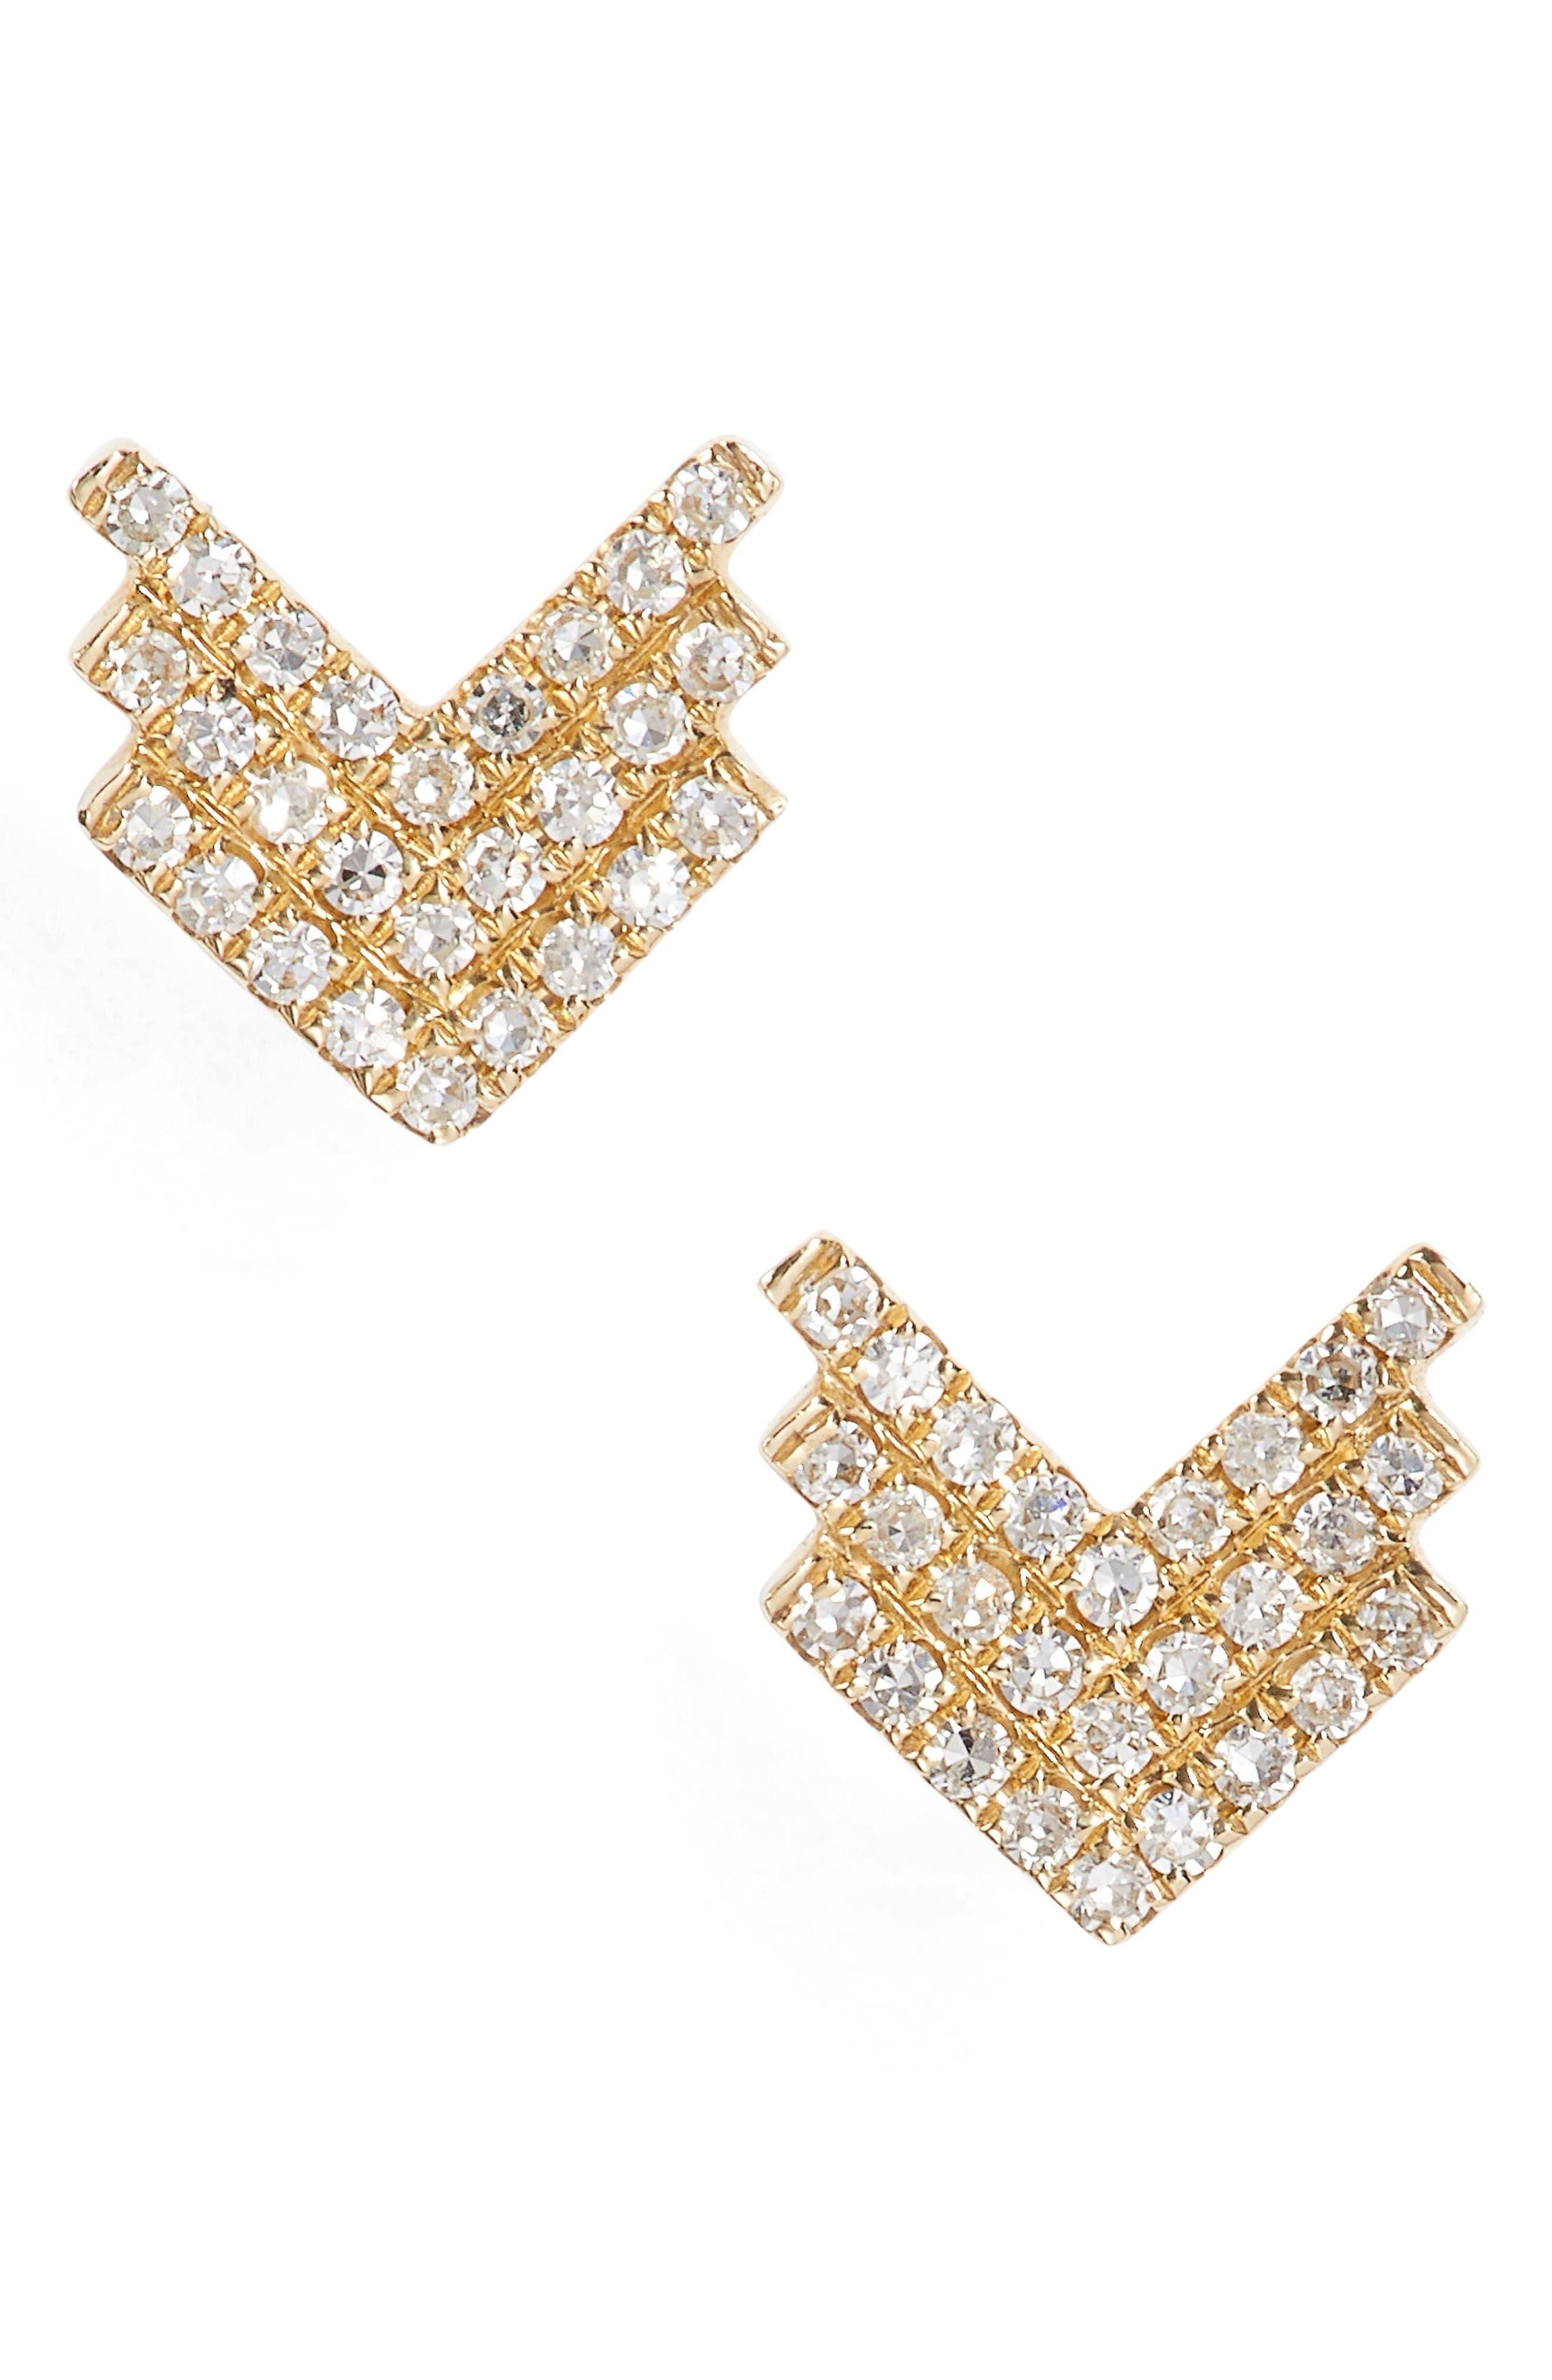 Shield Diamond Stud Earrings,                         Main,                         color, Yellow Gold